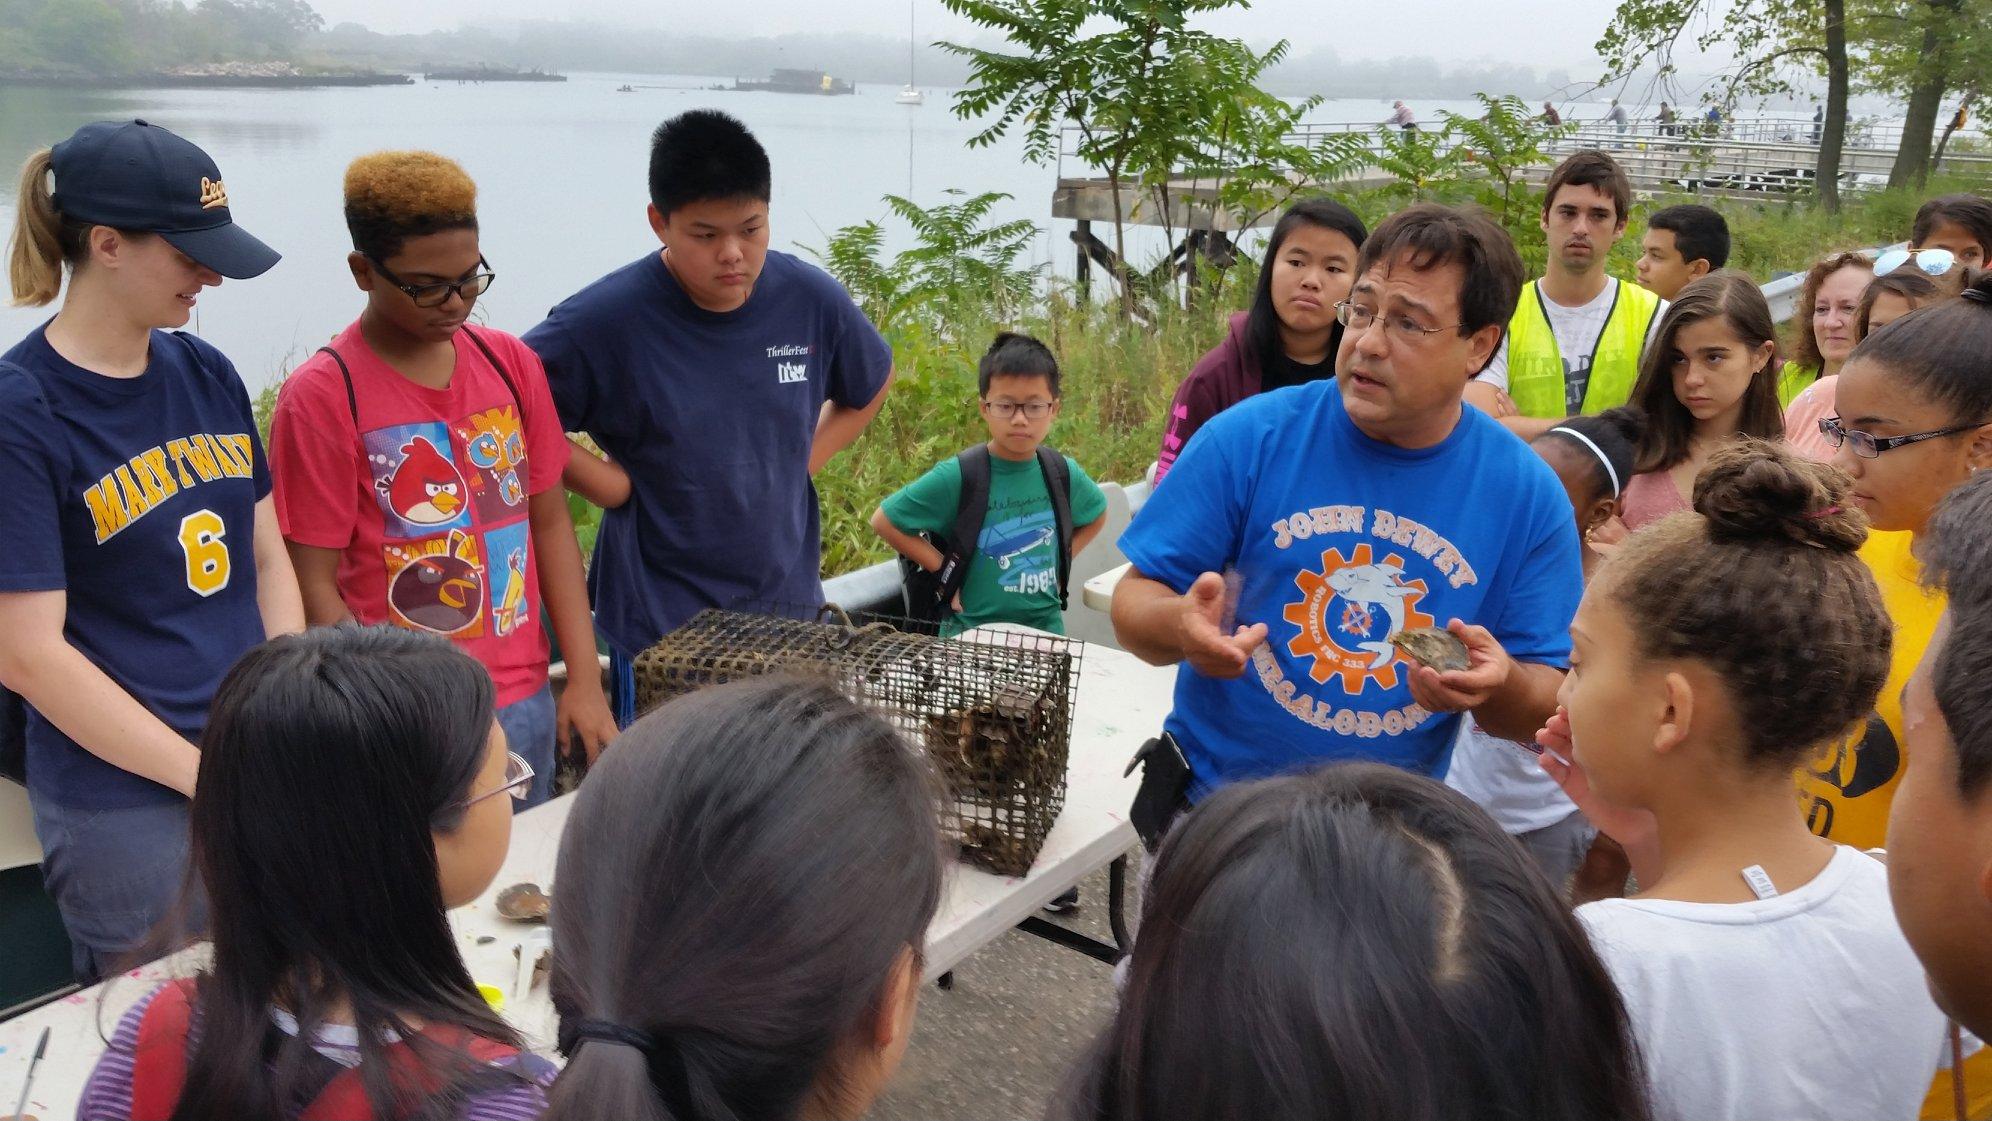 Oyster Monitoring, Coney Island Creek, Lane Rosen, NYSMEA, John Dewey High School, Partnerships for Parks